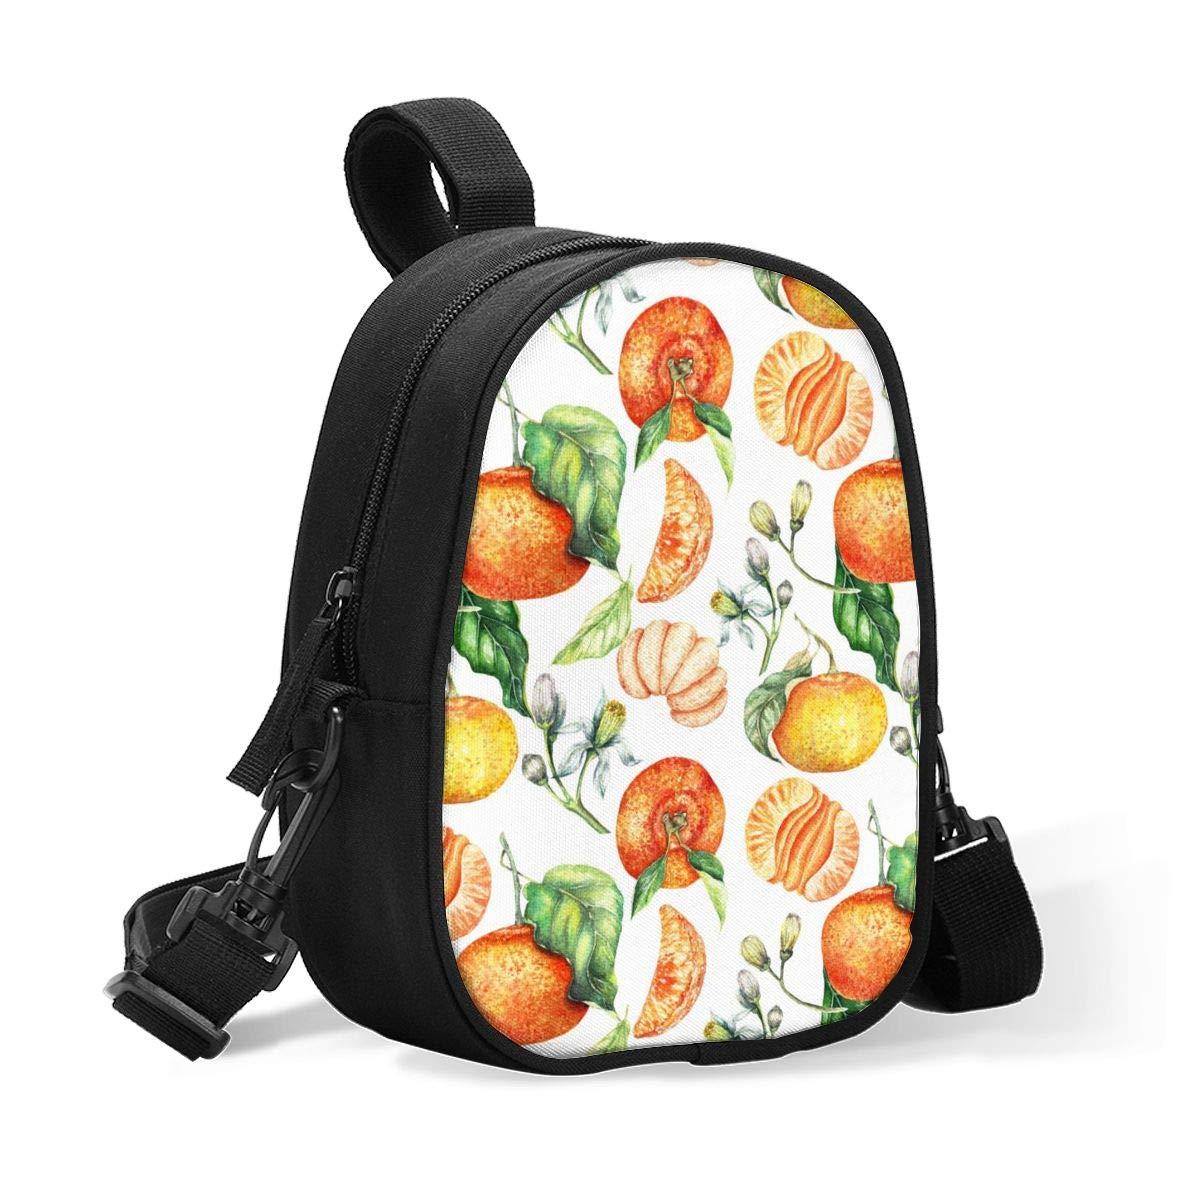 Breastmilk Cooler Bag Insulated Baby Bottle Bag Watercolor Painted Clementines Lovely Fruit Orange Reusable Baby Bottle Warmer Tote Bag Handbag Lunch Bag Box For 2 Large Bottles For Nursing Mom,Stroll